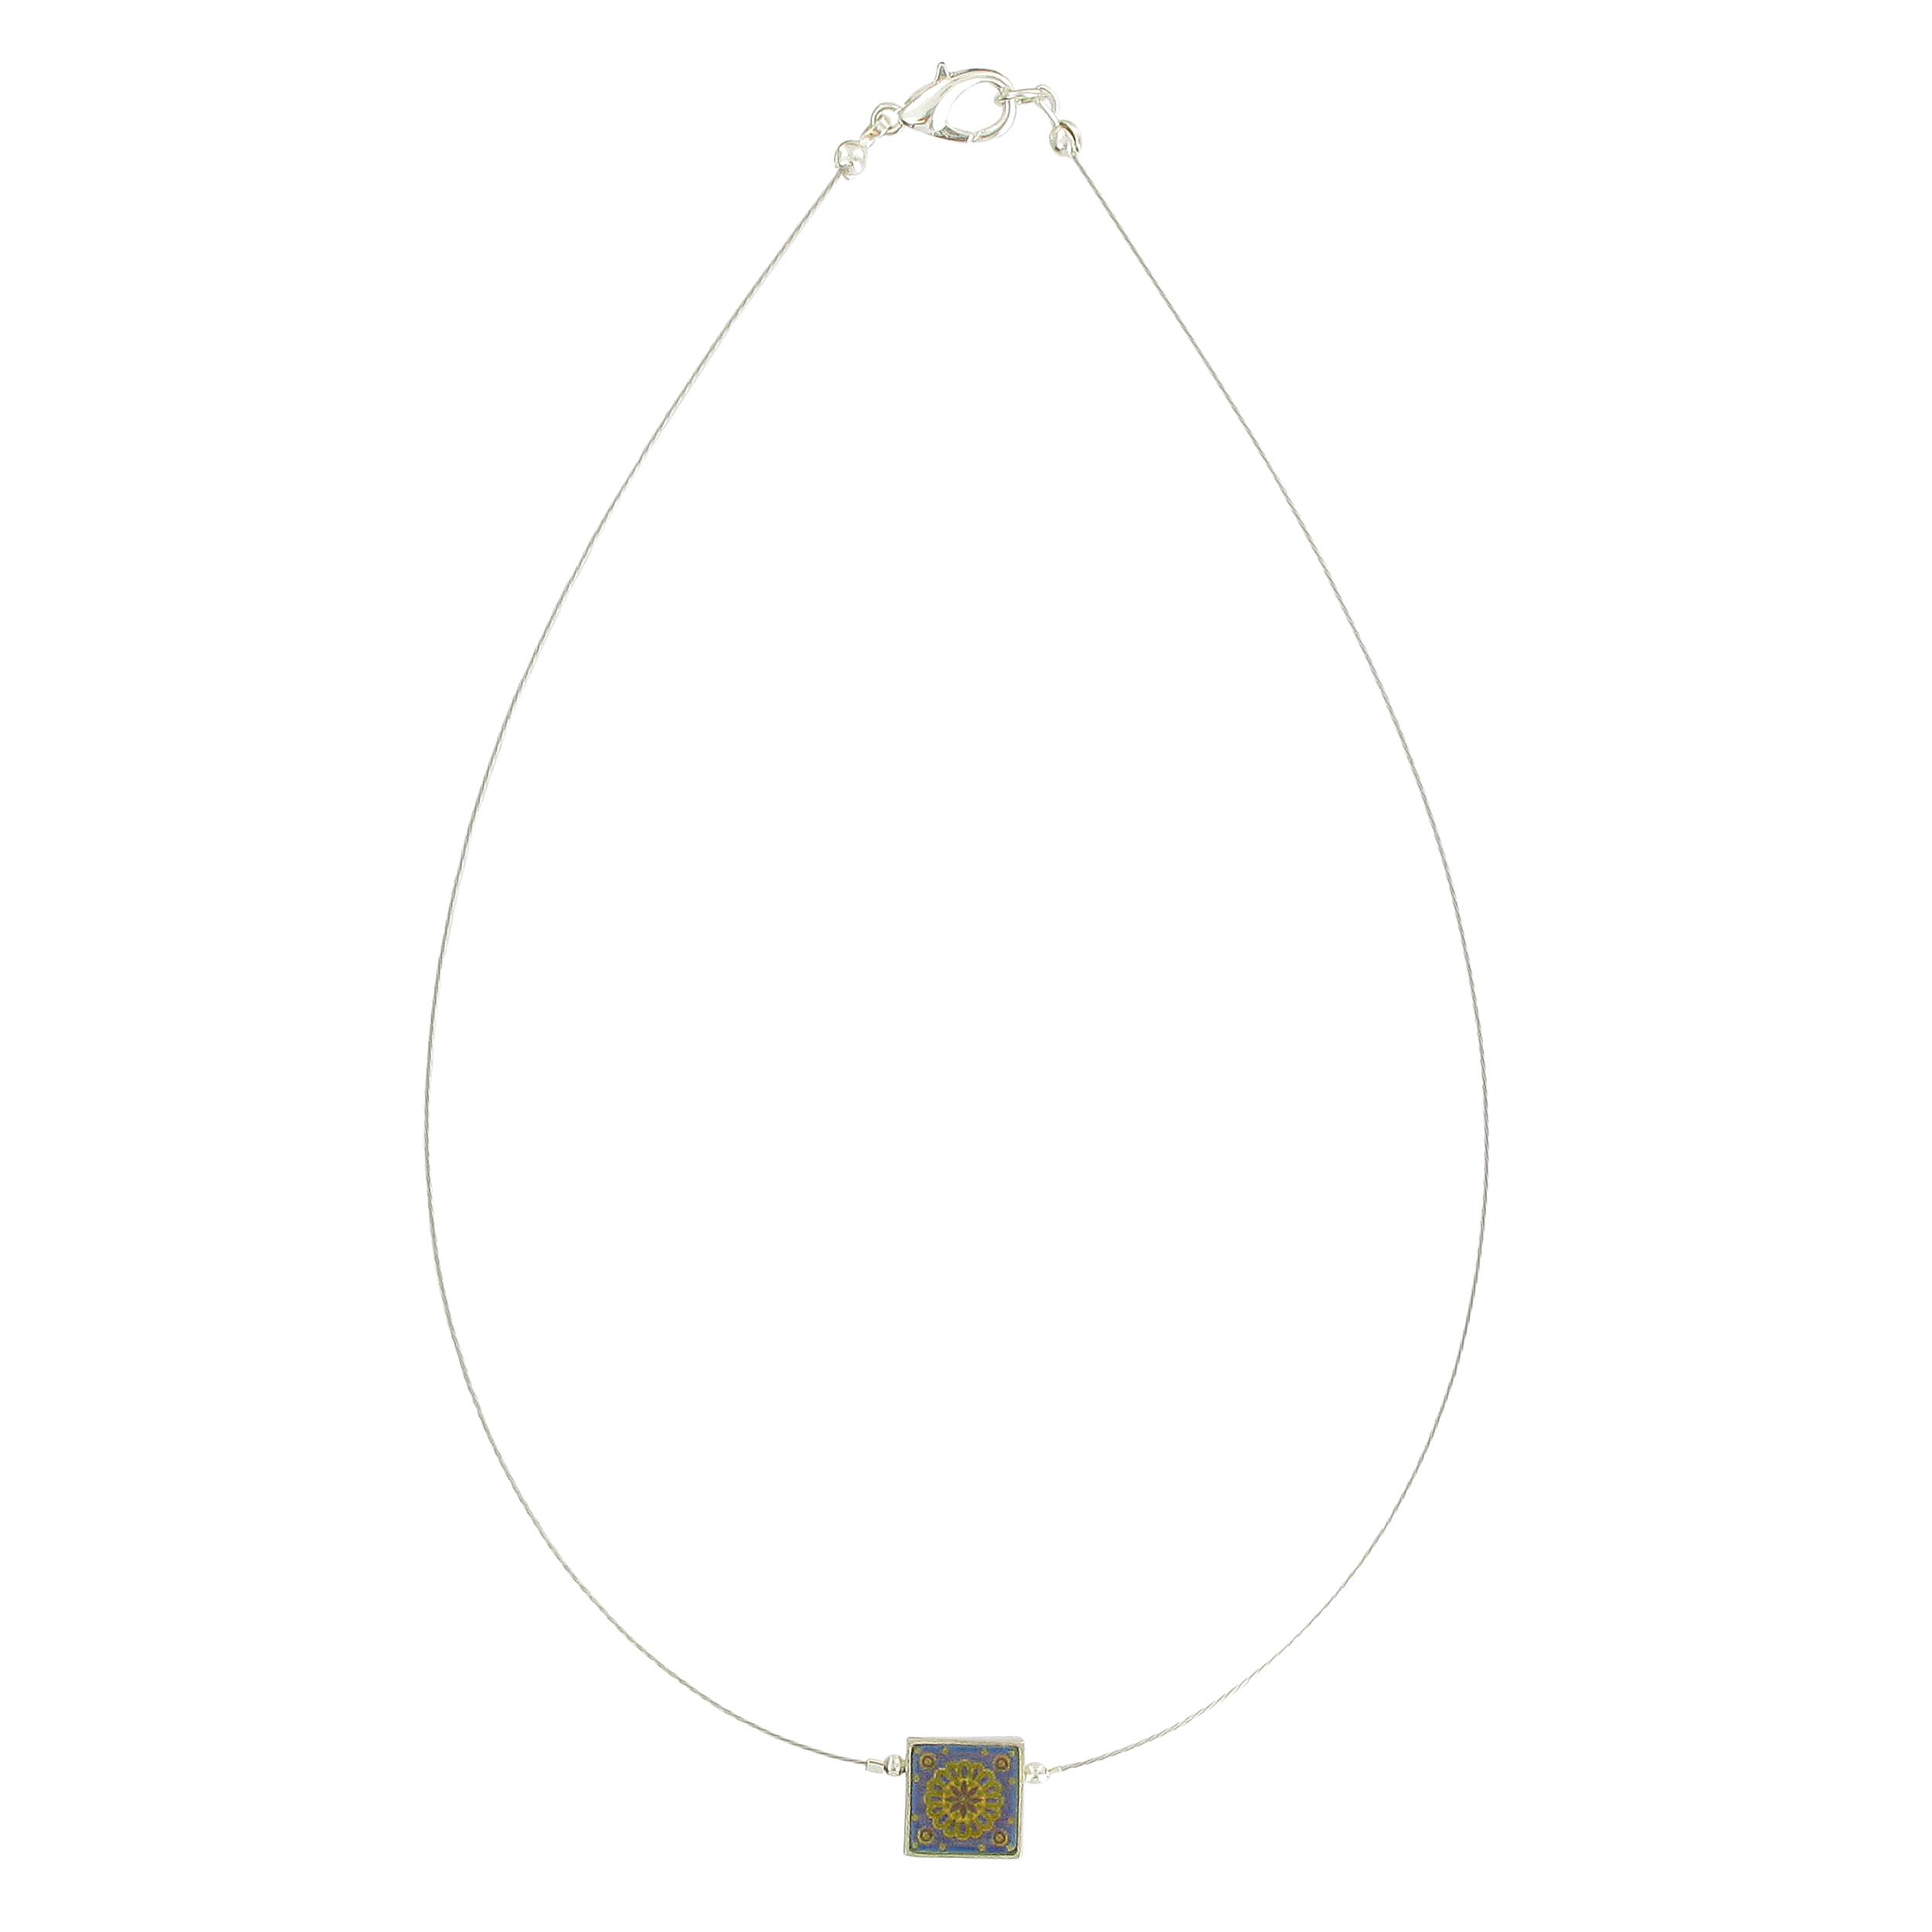 Islamic art pendant necklace